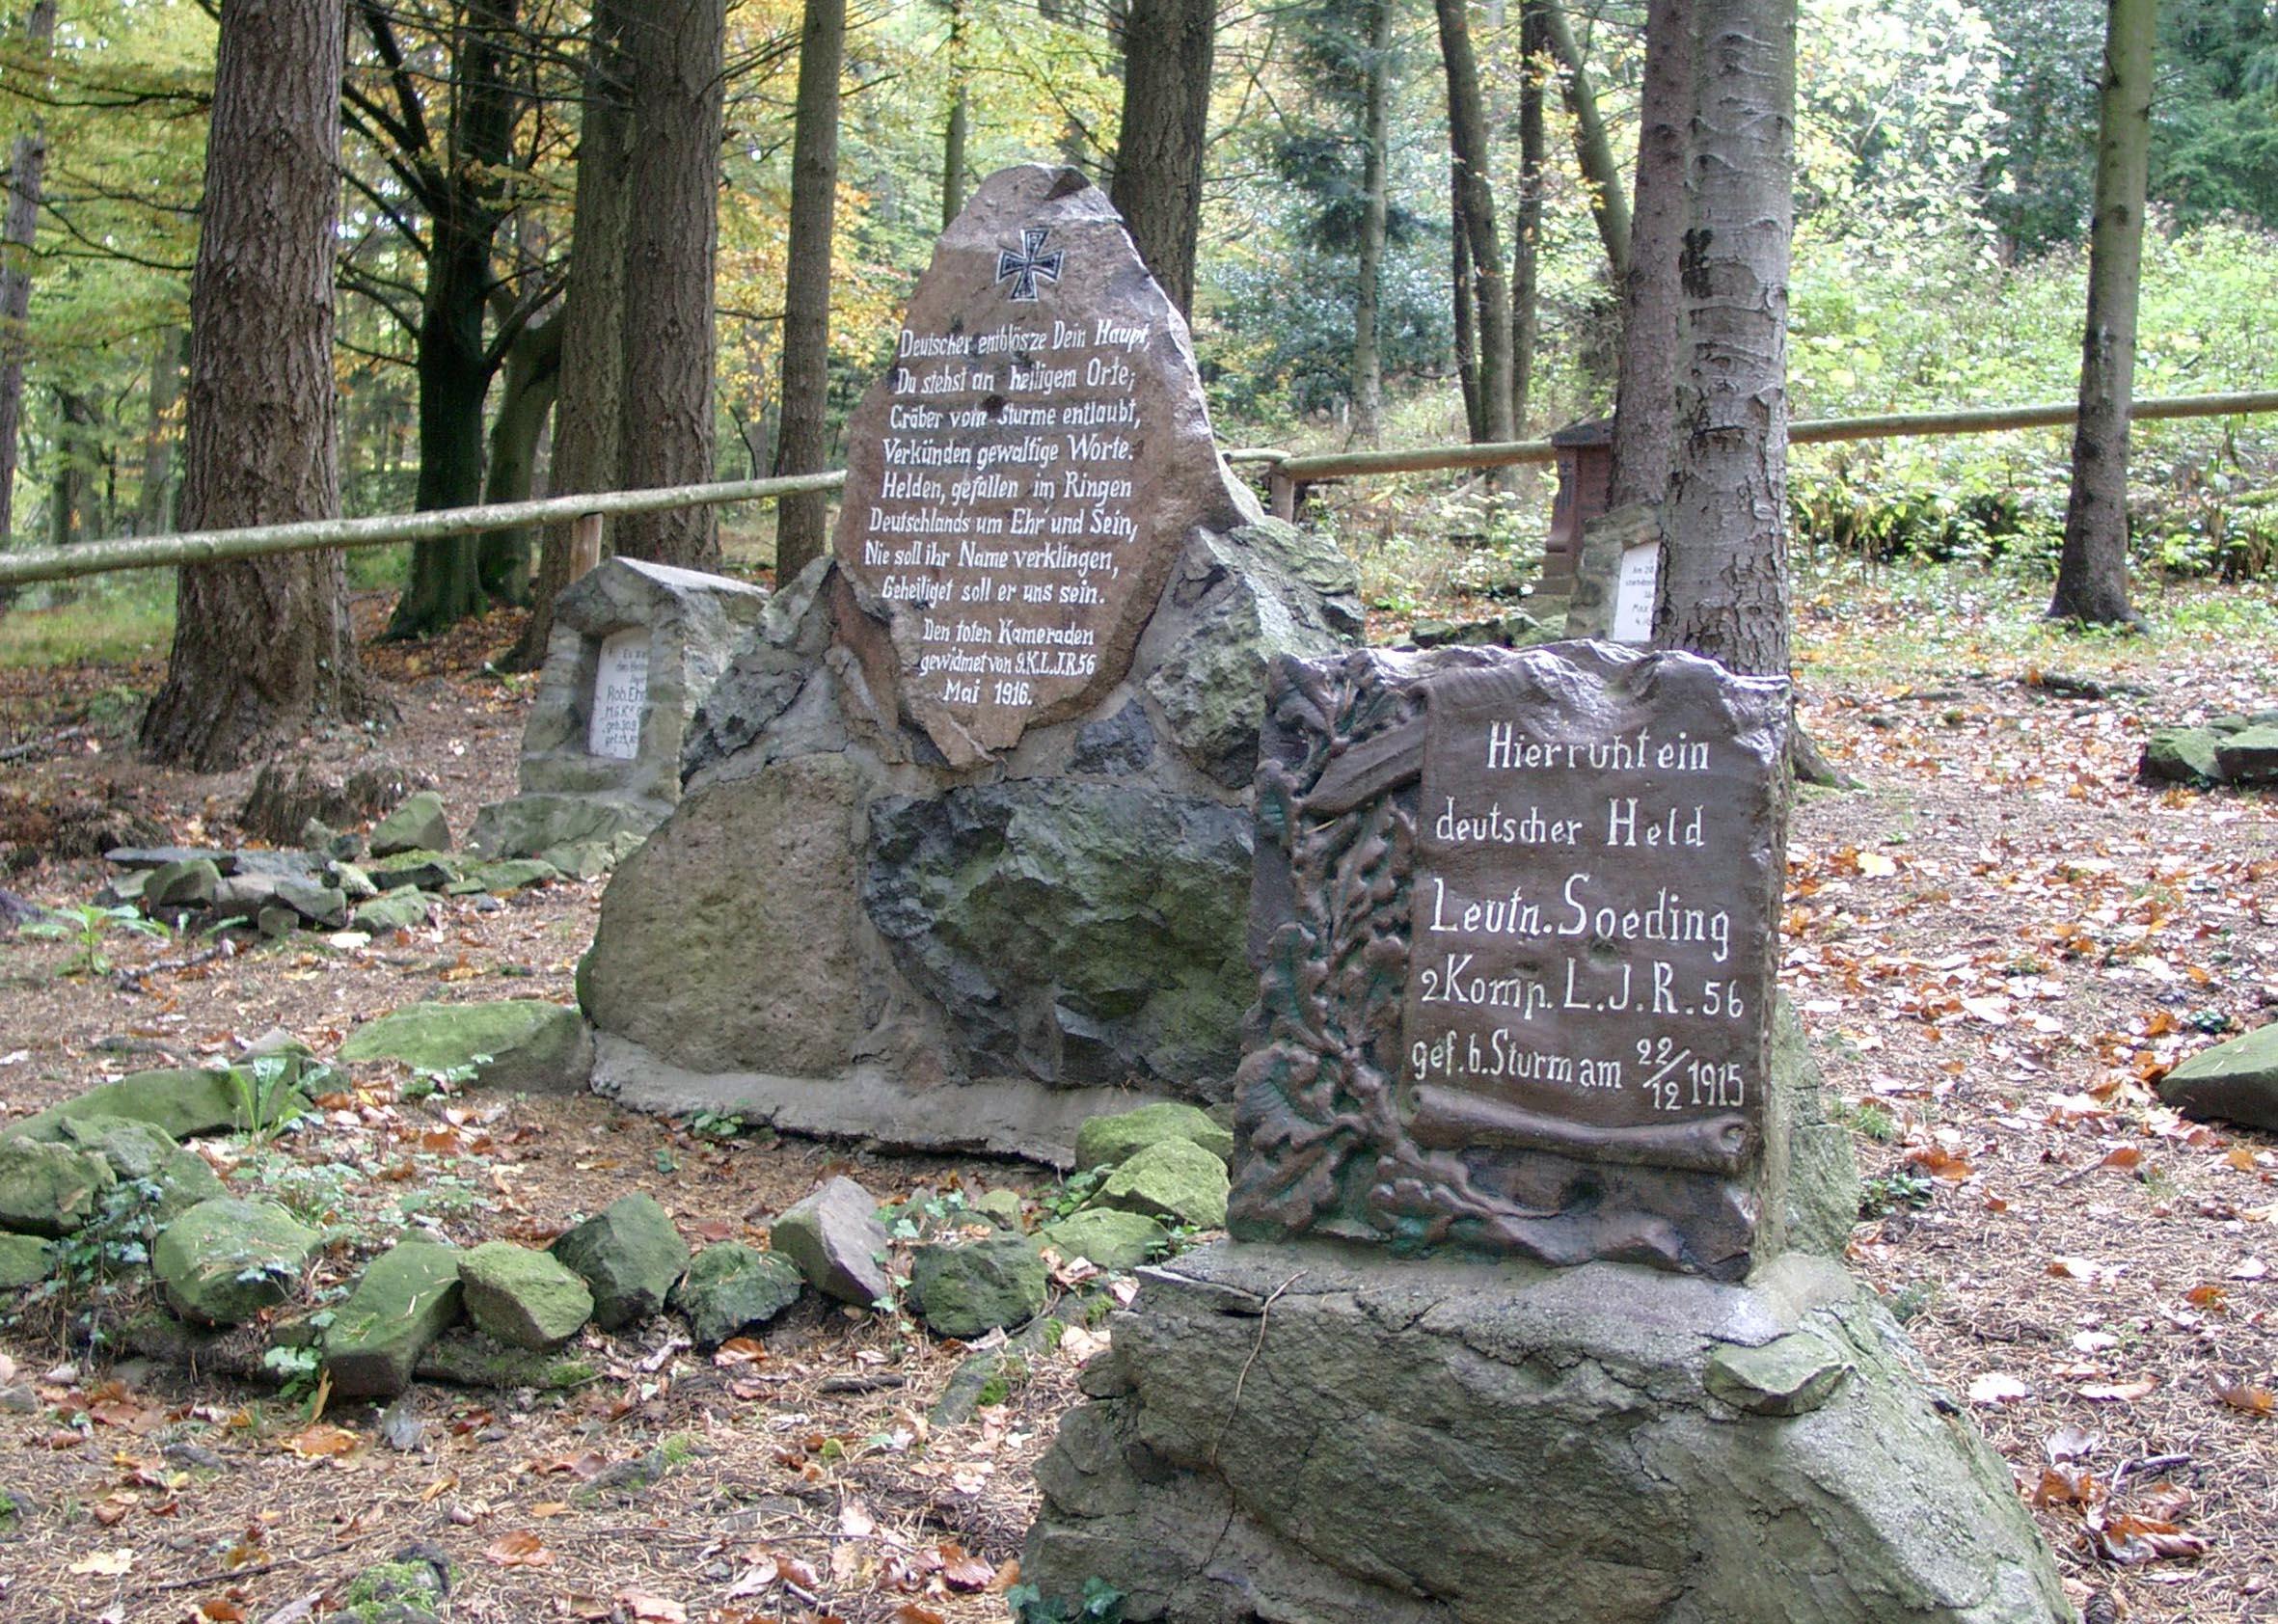 Jägerfriedhof am Fuß des Hartmannsweilerkopfes